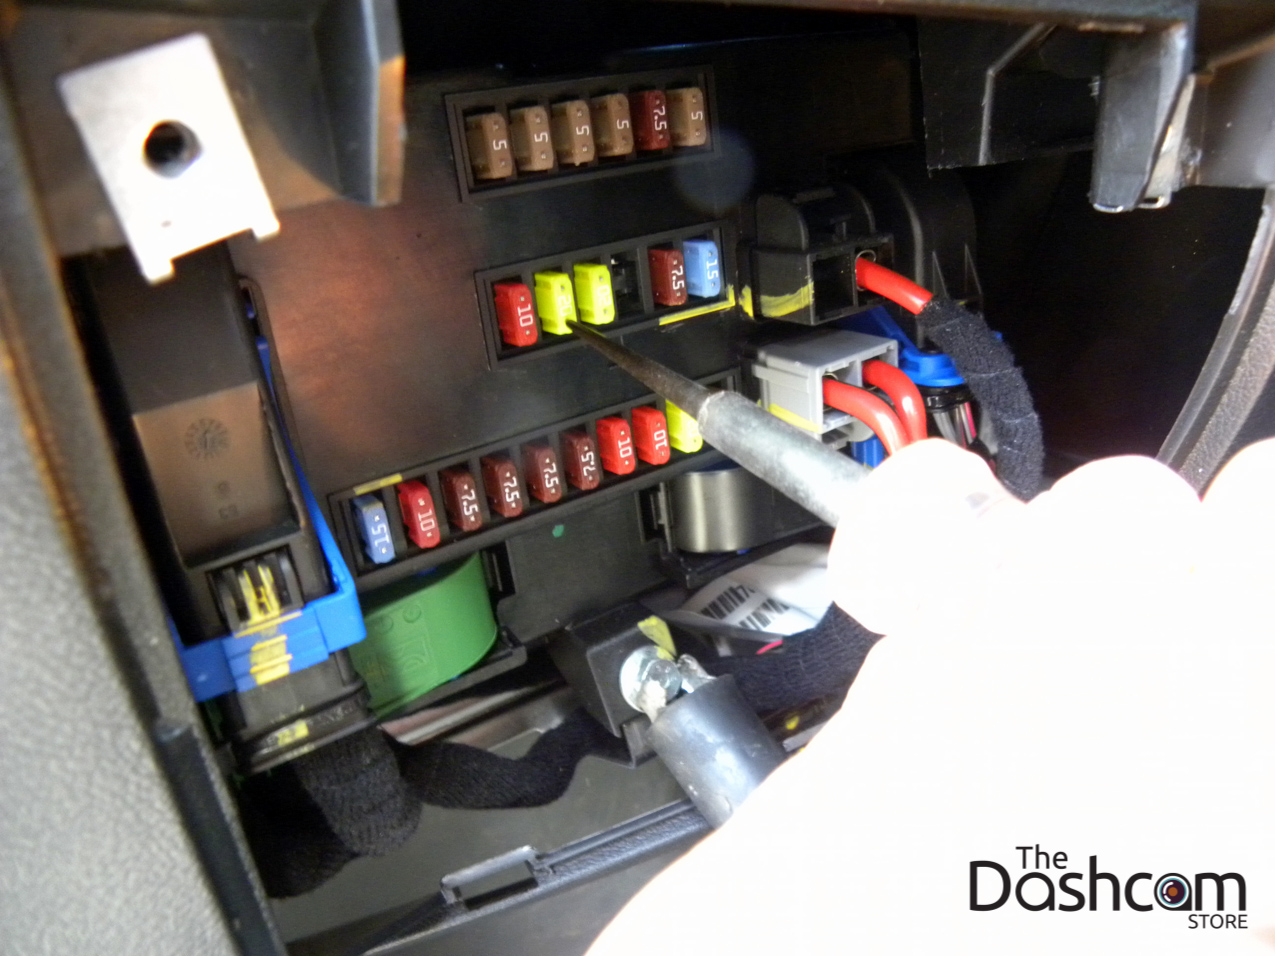 3500 Fuse Box Diagram On Wiring Diagram 2005 Dodge Ram 1500 Trailer